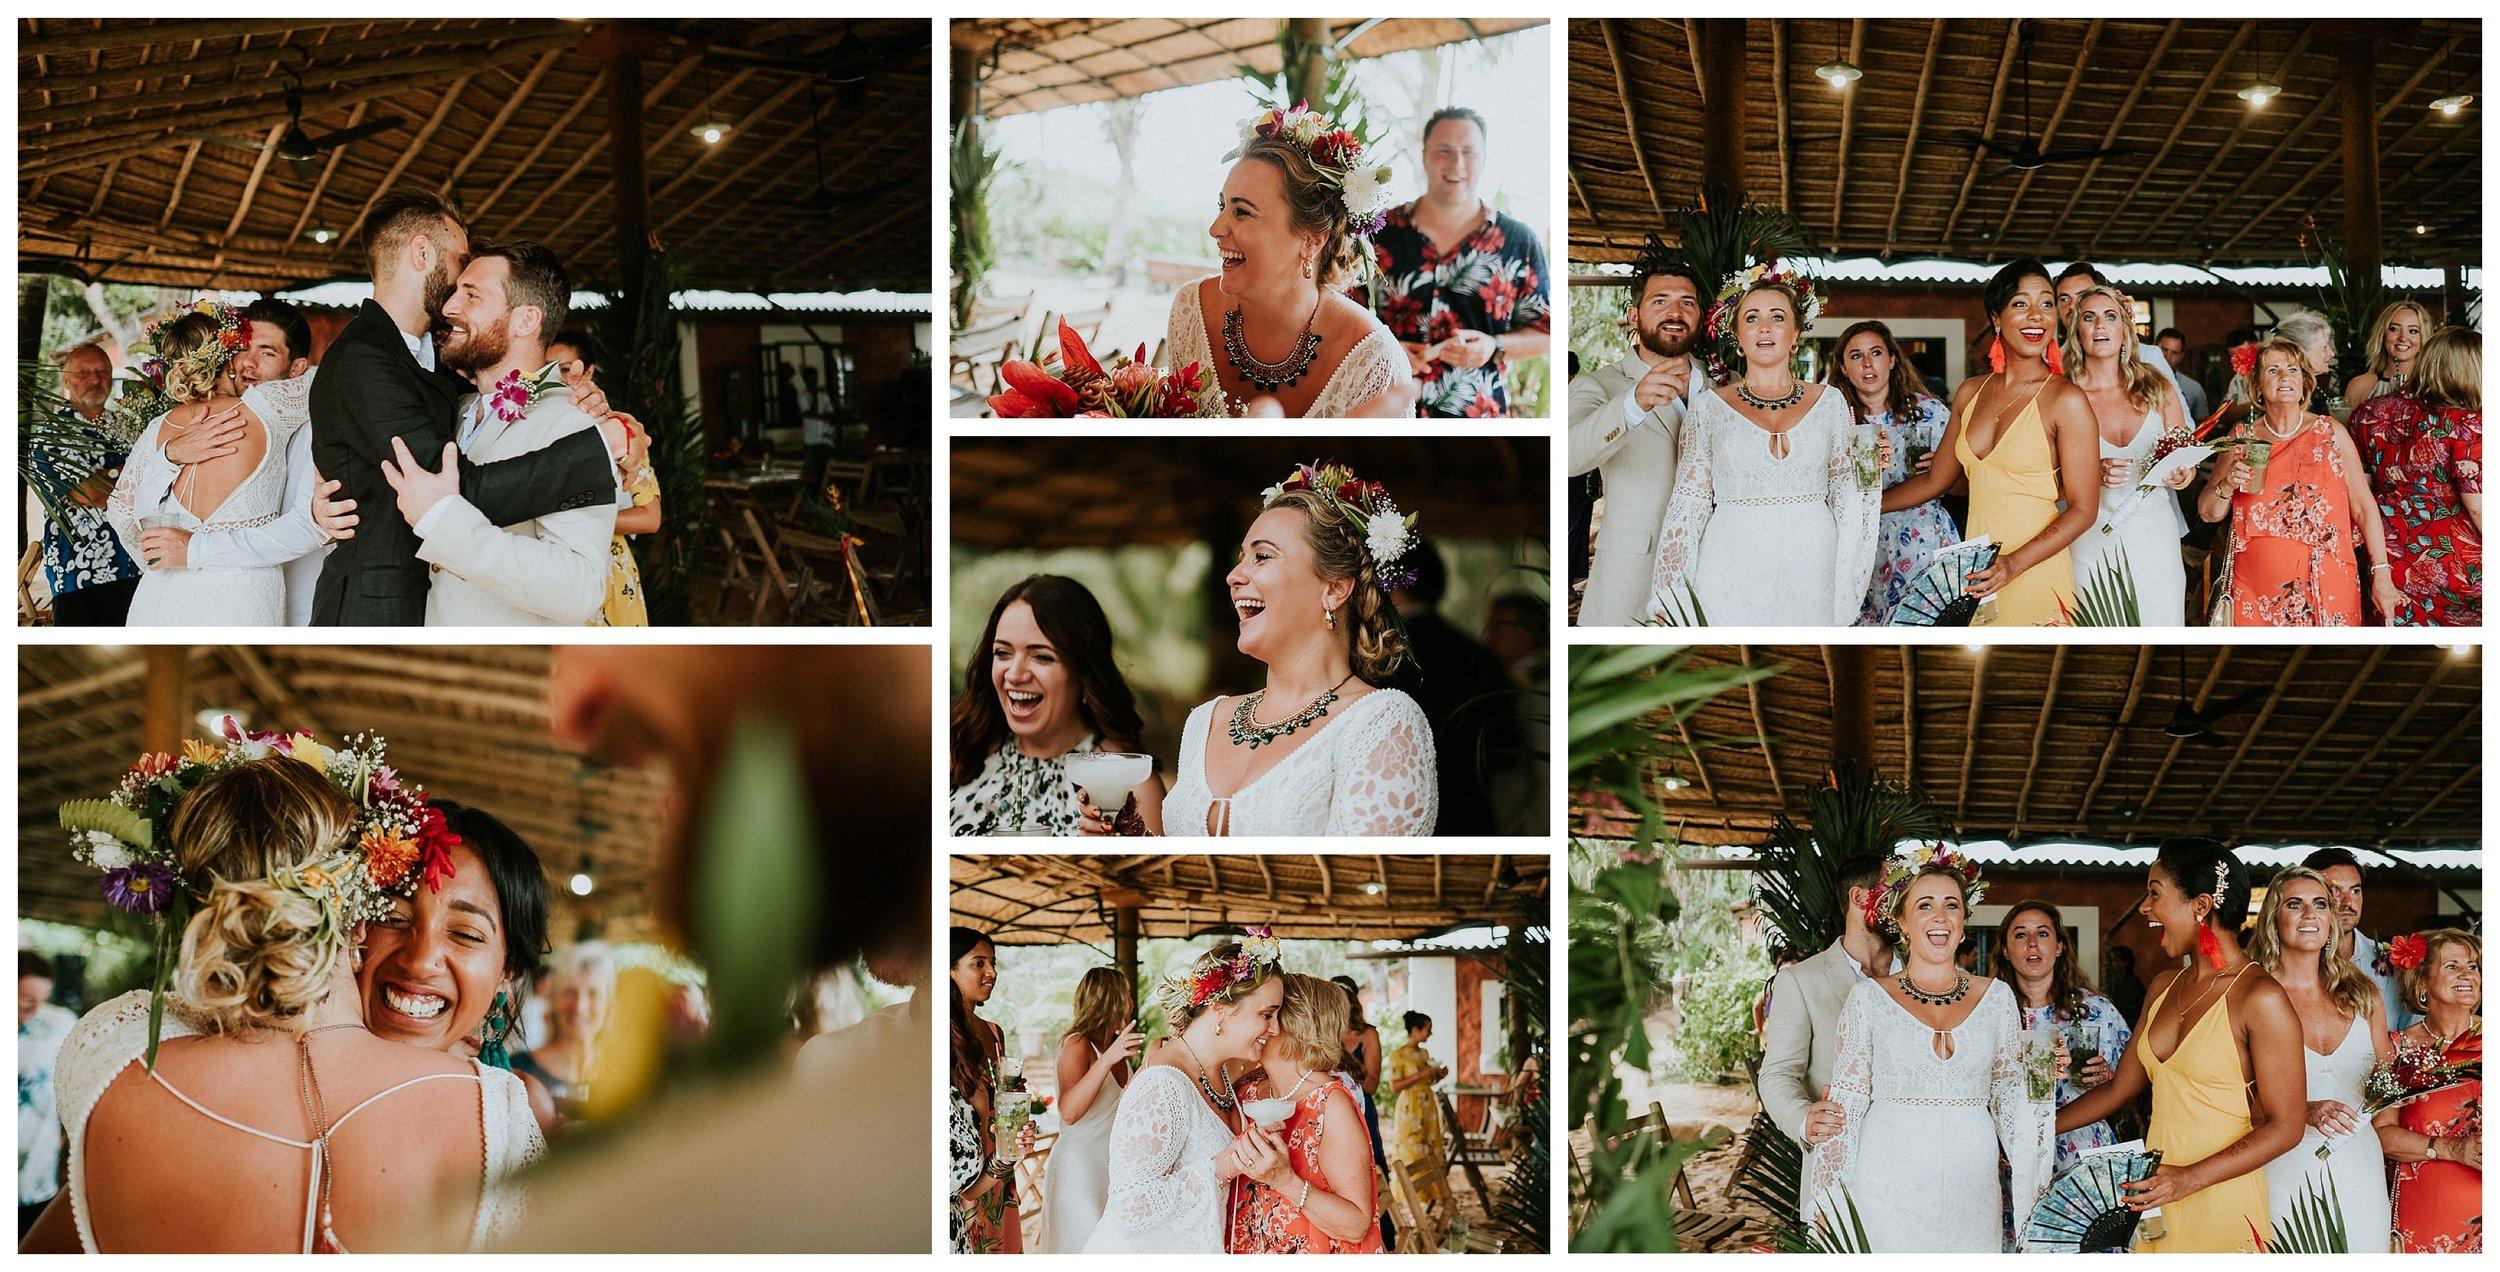 Goa Destination Wedding Photographer India Colouful Fun Joanna Nicole Photography Coco Shambhala13.jpg